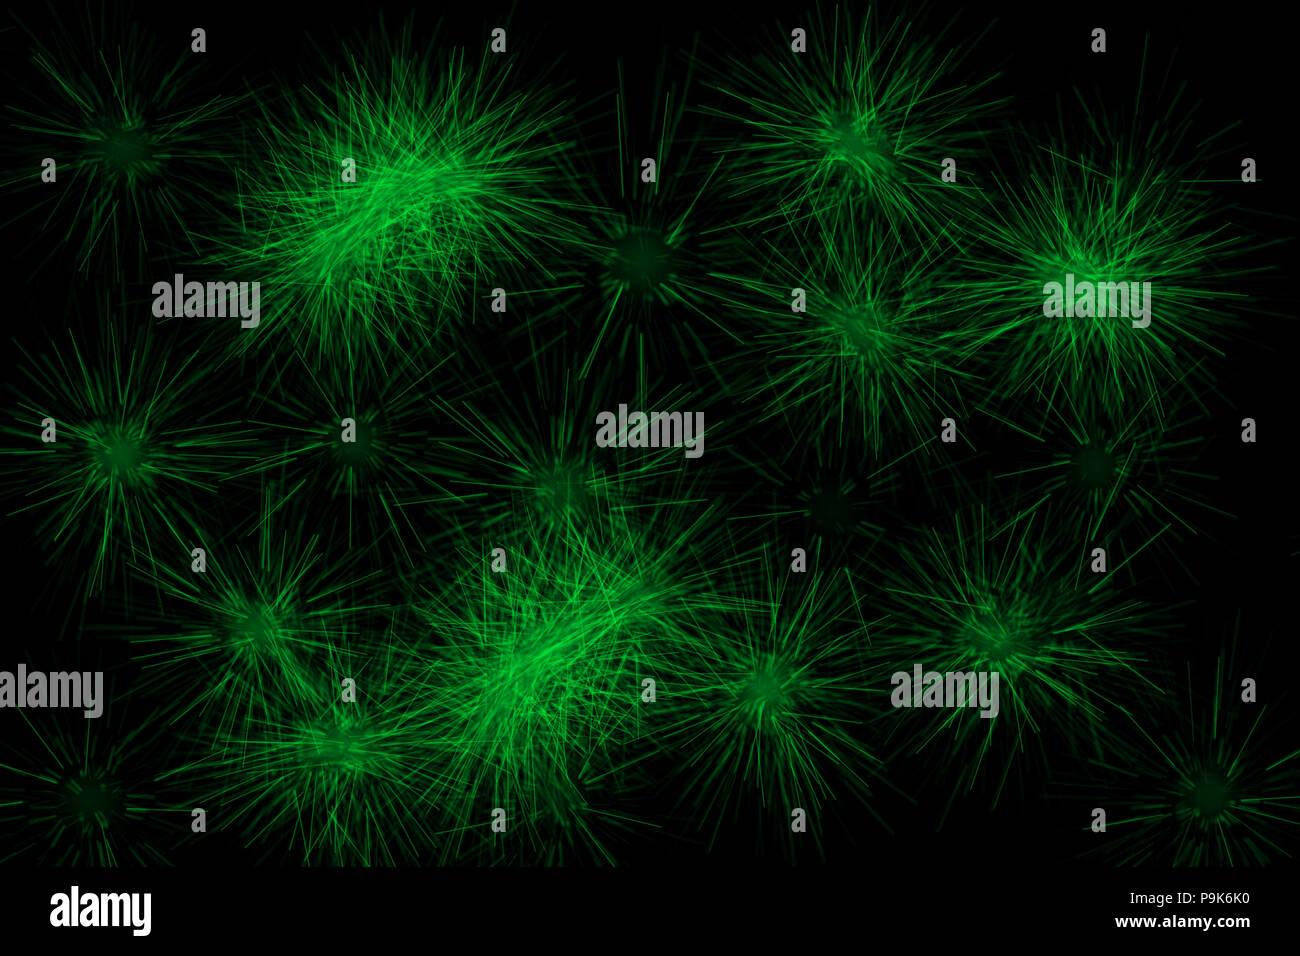 Fuochi D Artificio Scintille Sfondo Astratto Al Neon Verde